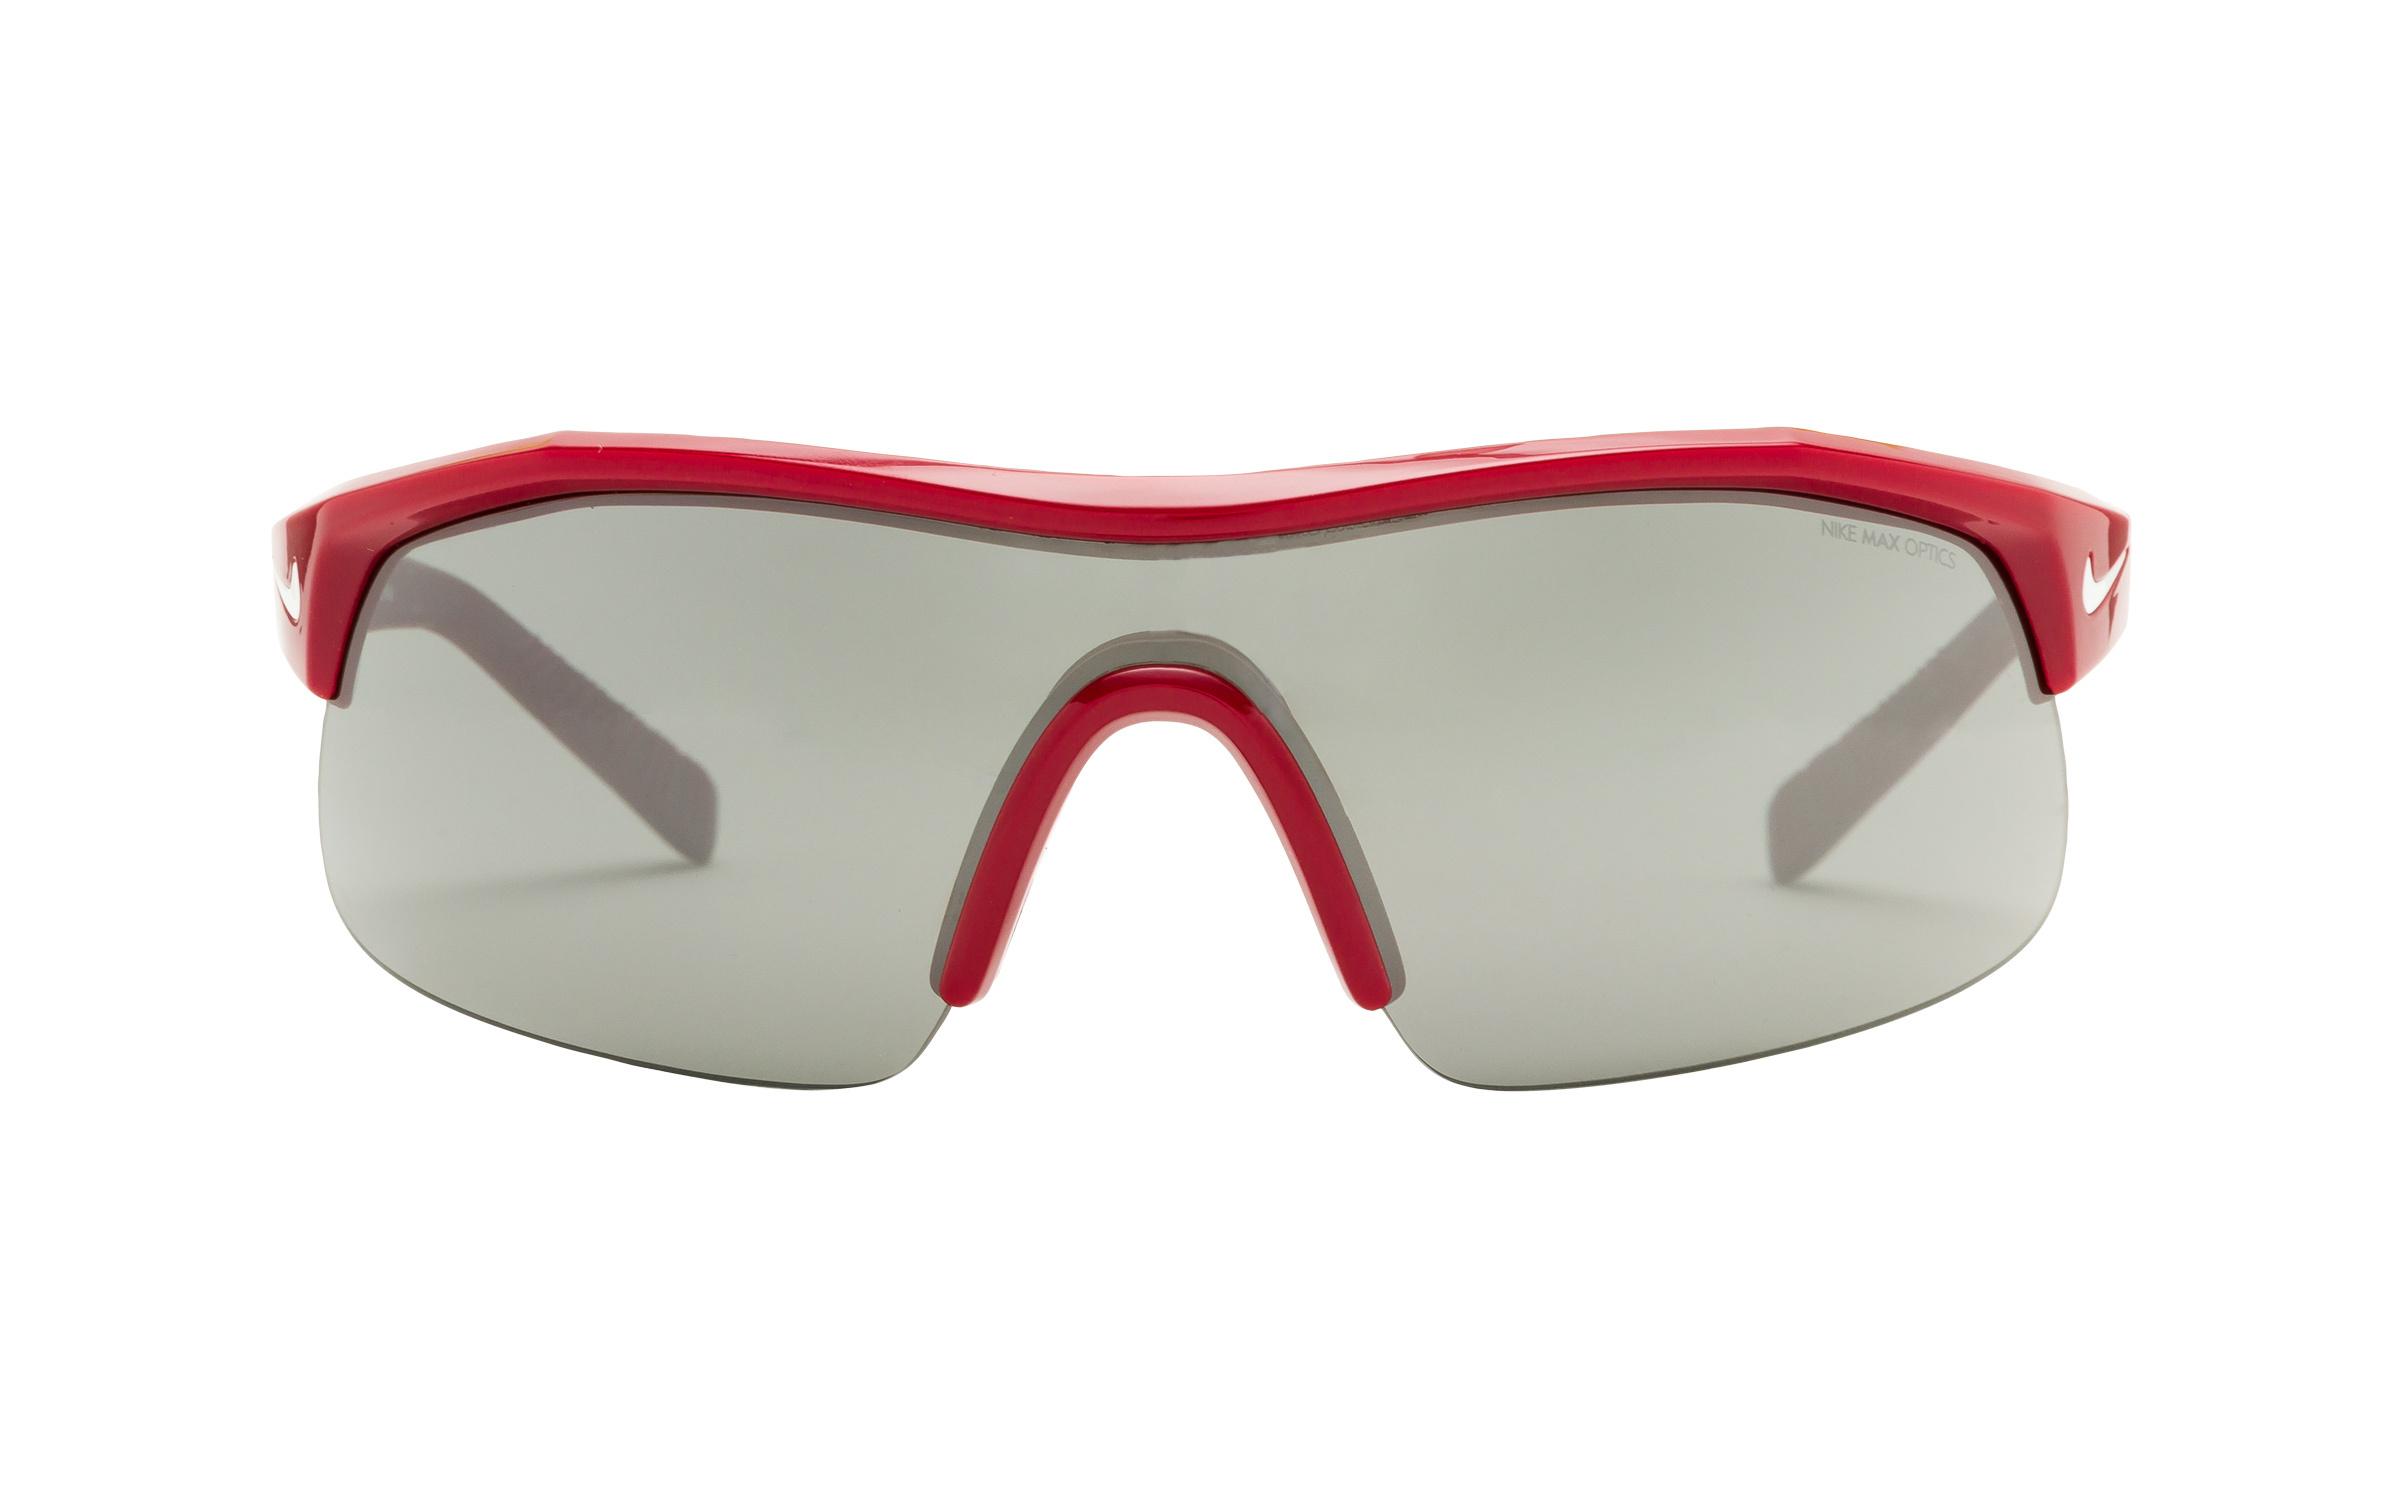 Nike Sunglasses Red Online Coastal